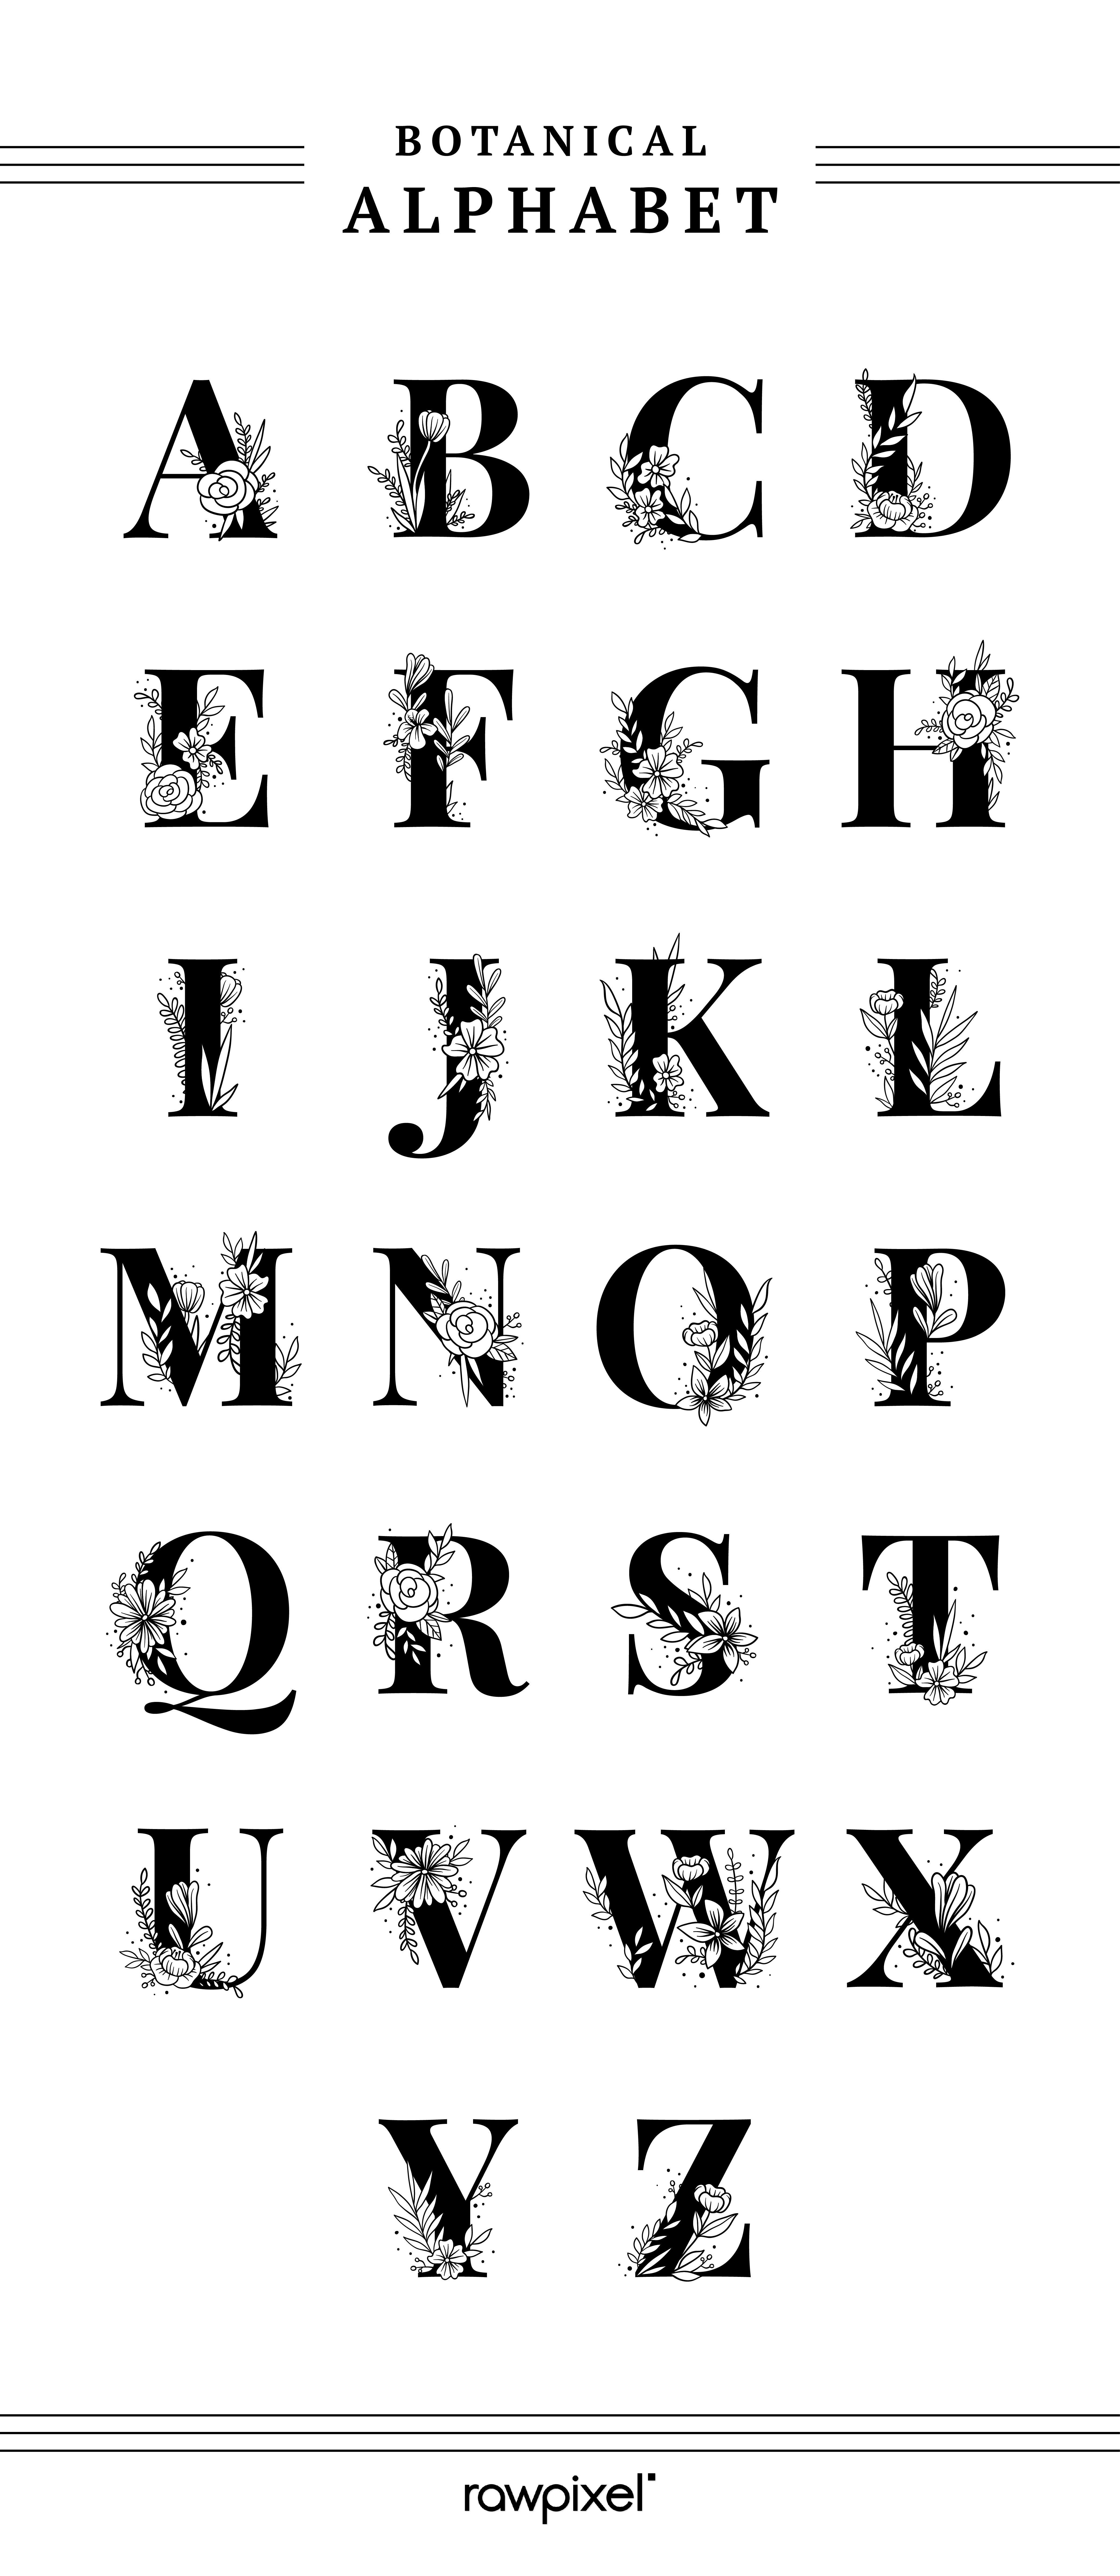 Get free and premium royaltyfree botanical alphabet